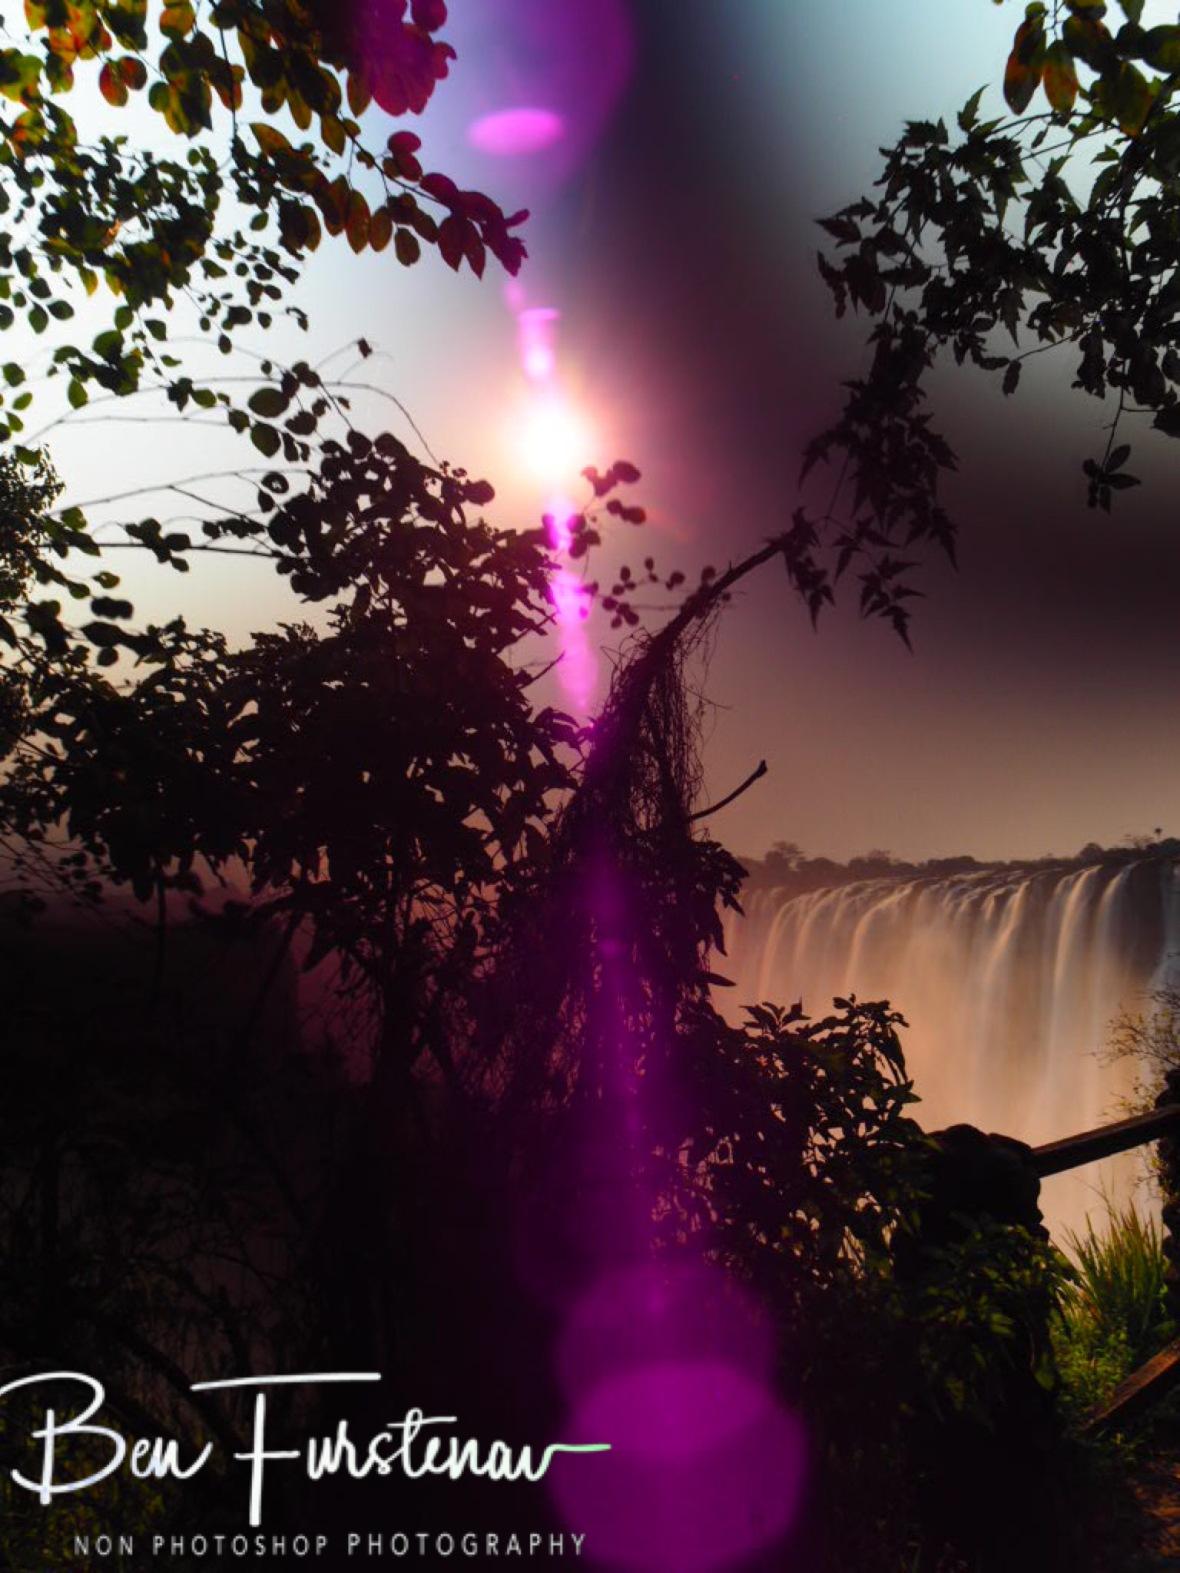 Ultra violet rays, Victoria Falls, Zambia